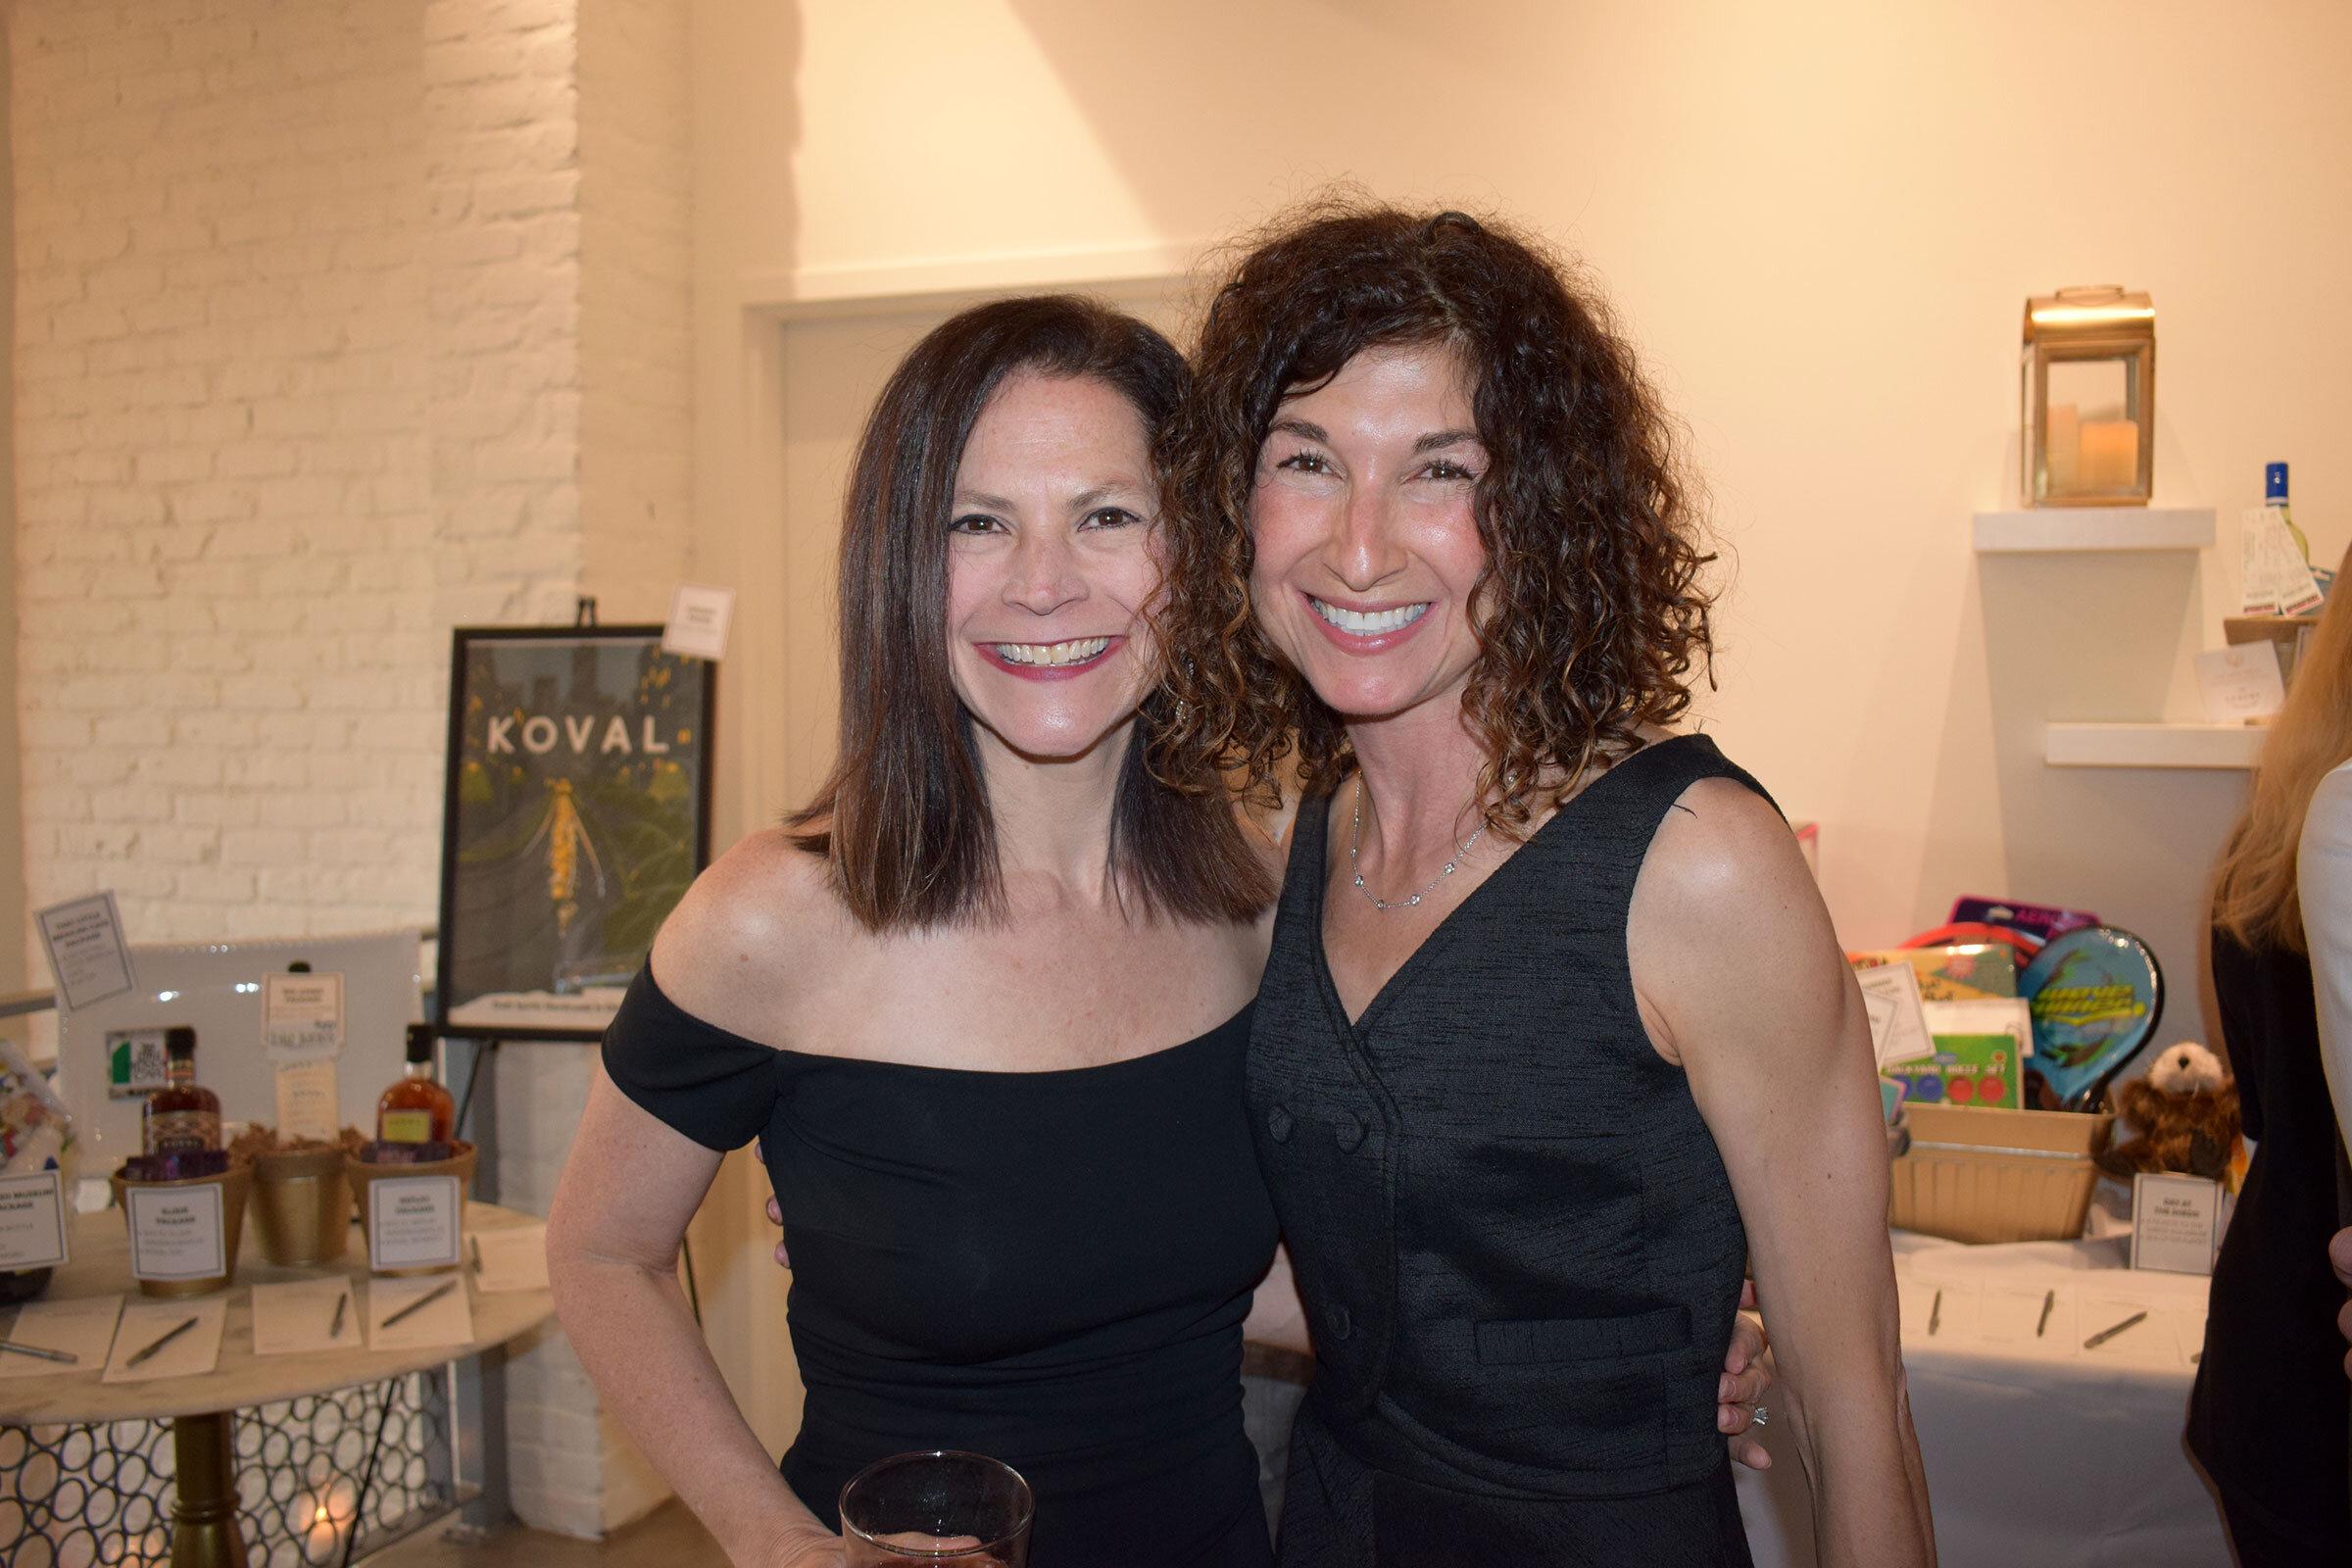 Rachel Mantz & Cortney Stark Cope